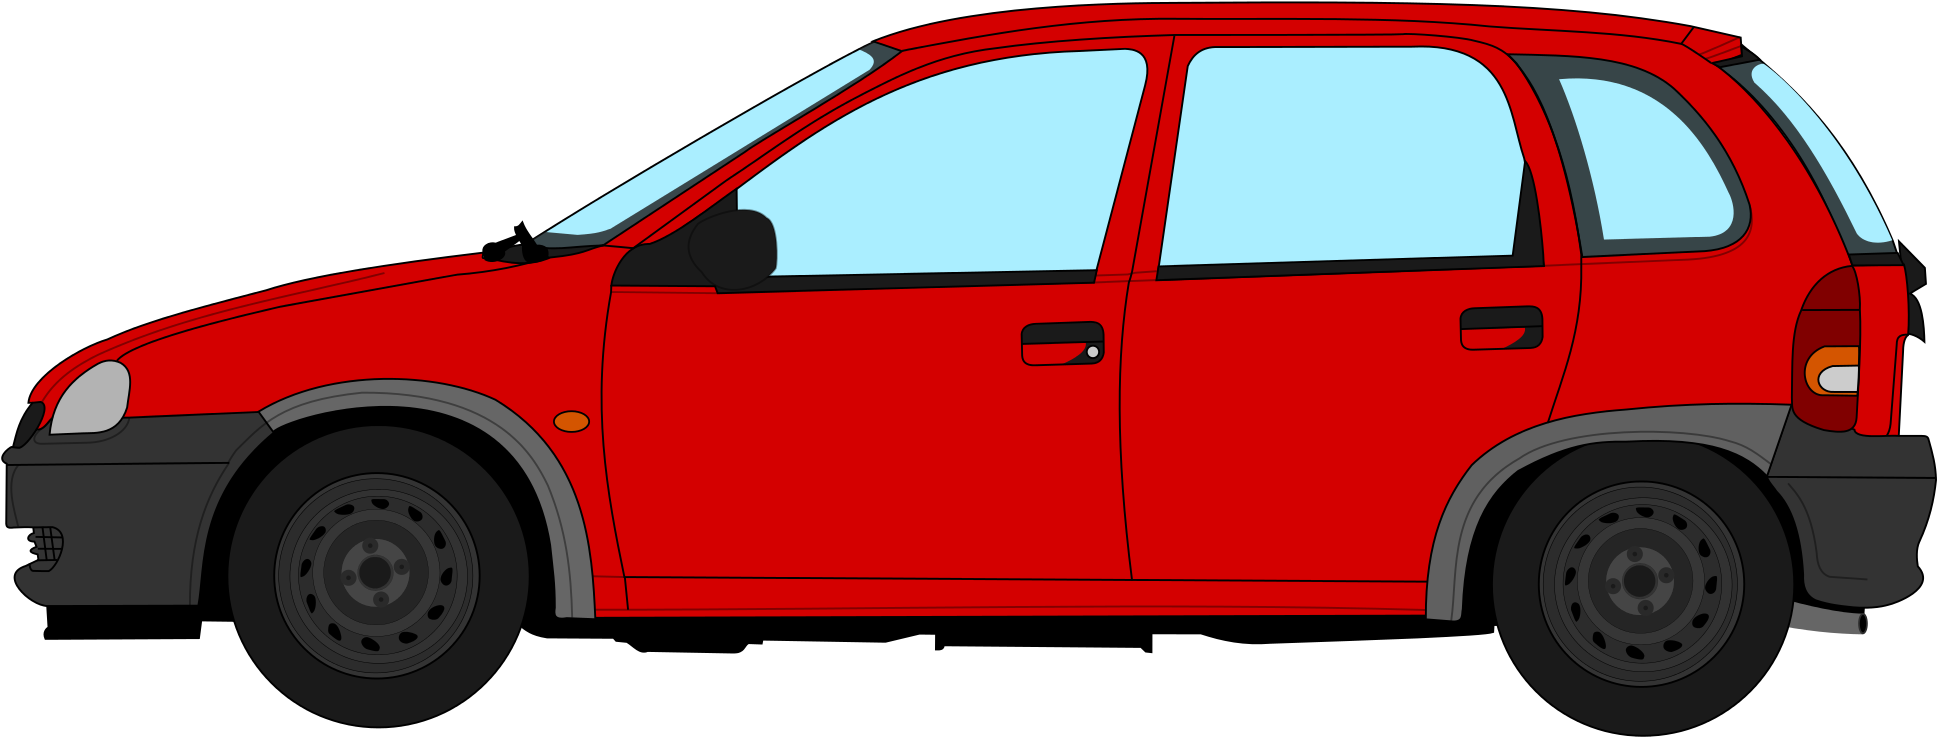 HD Opel Corsa B Profile.